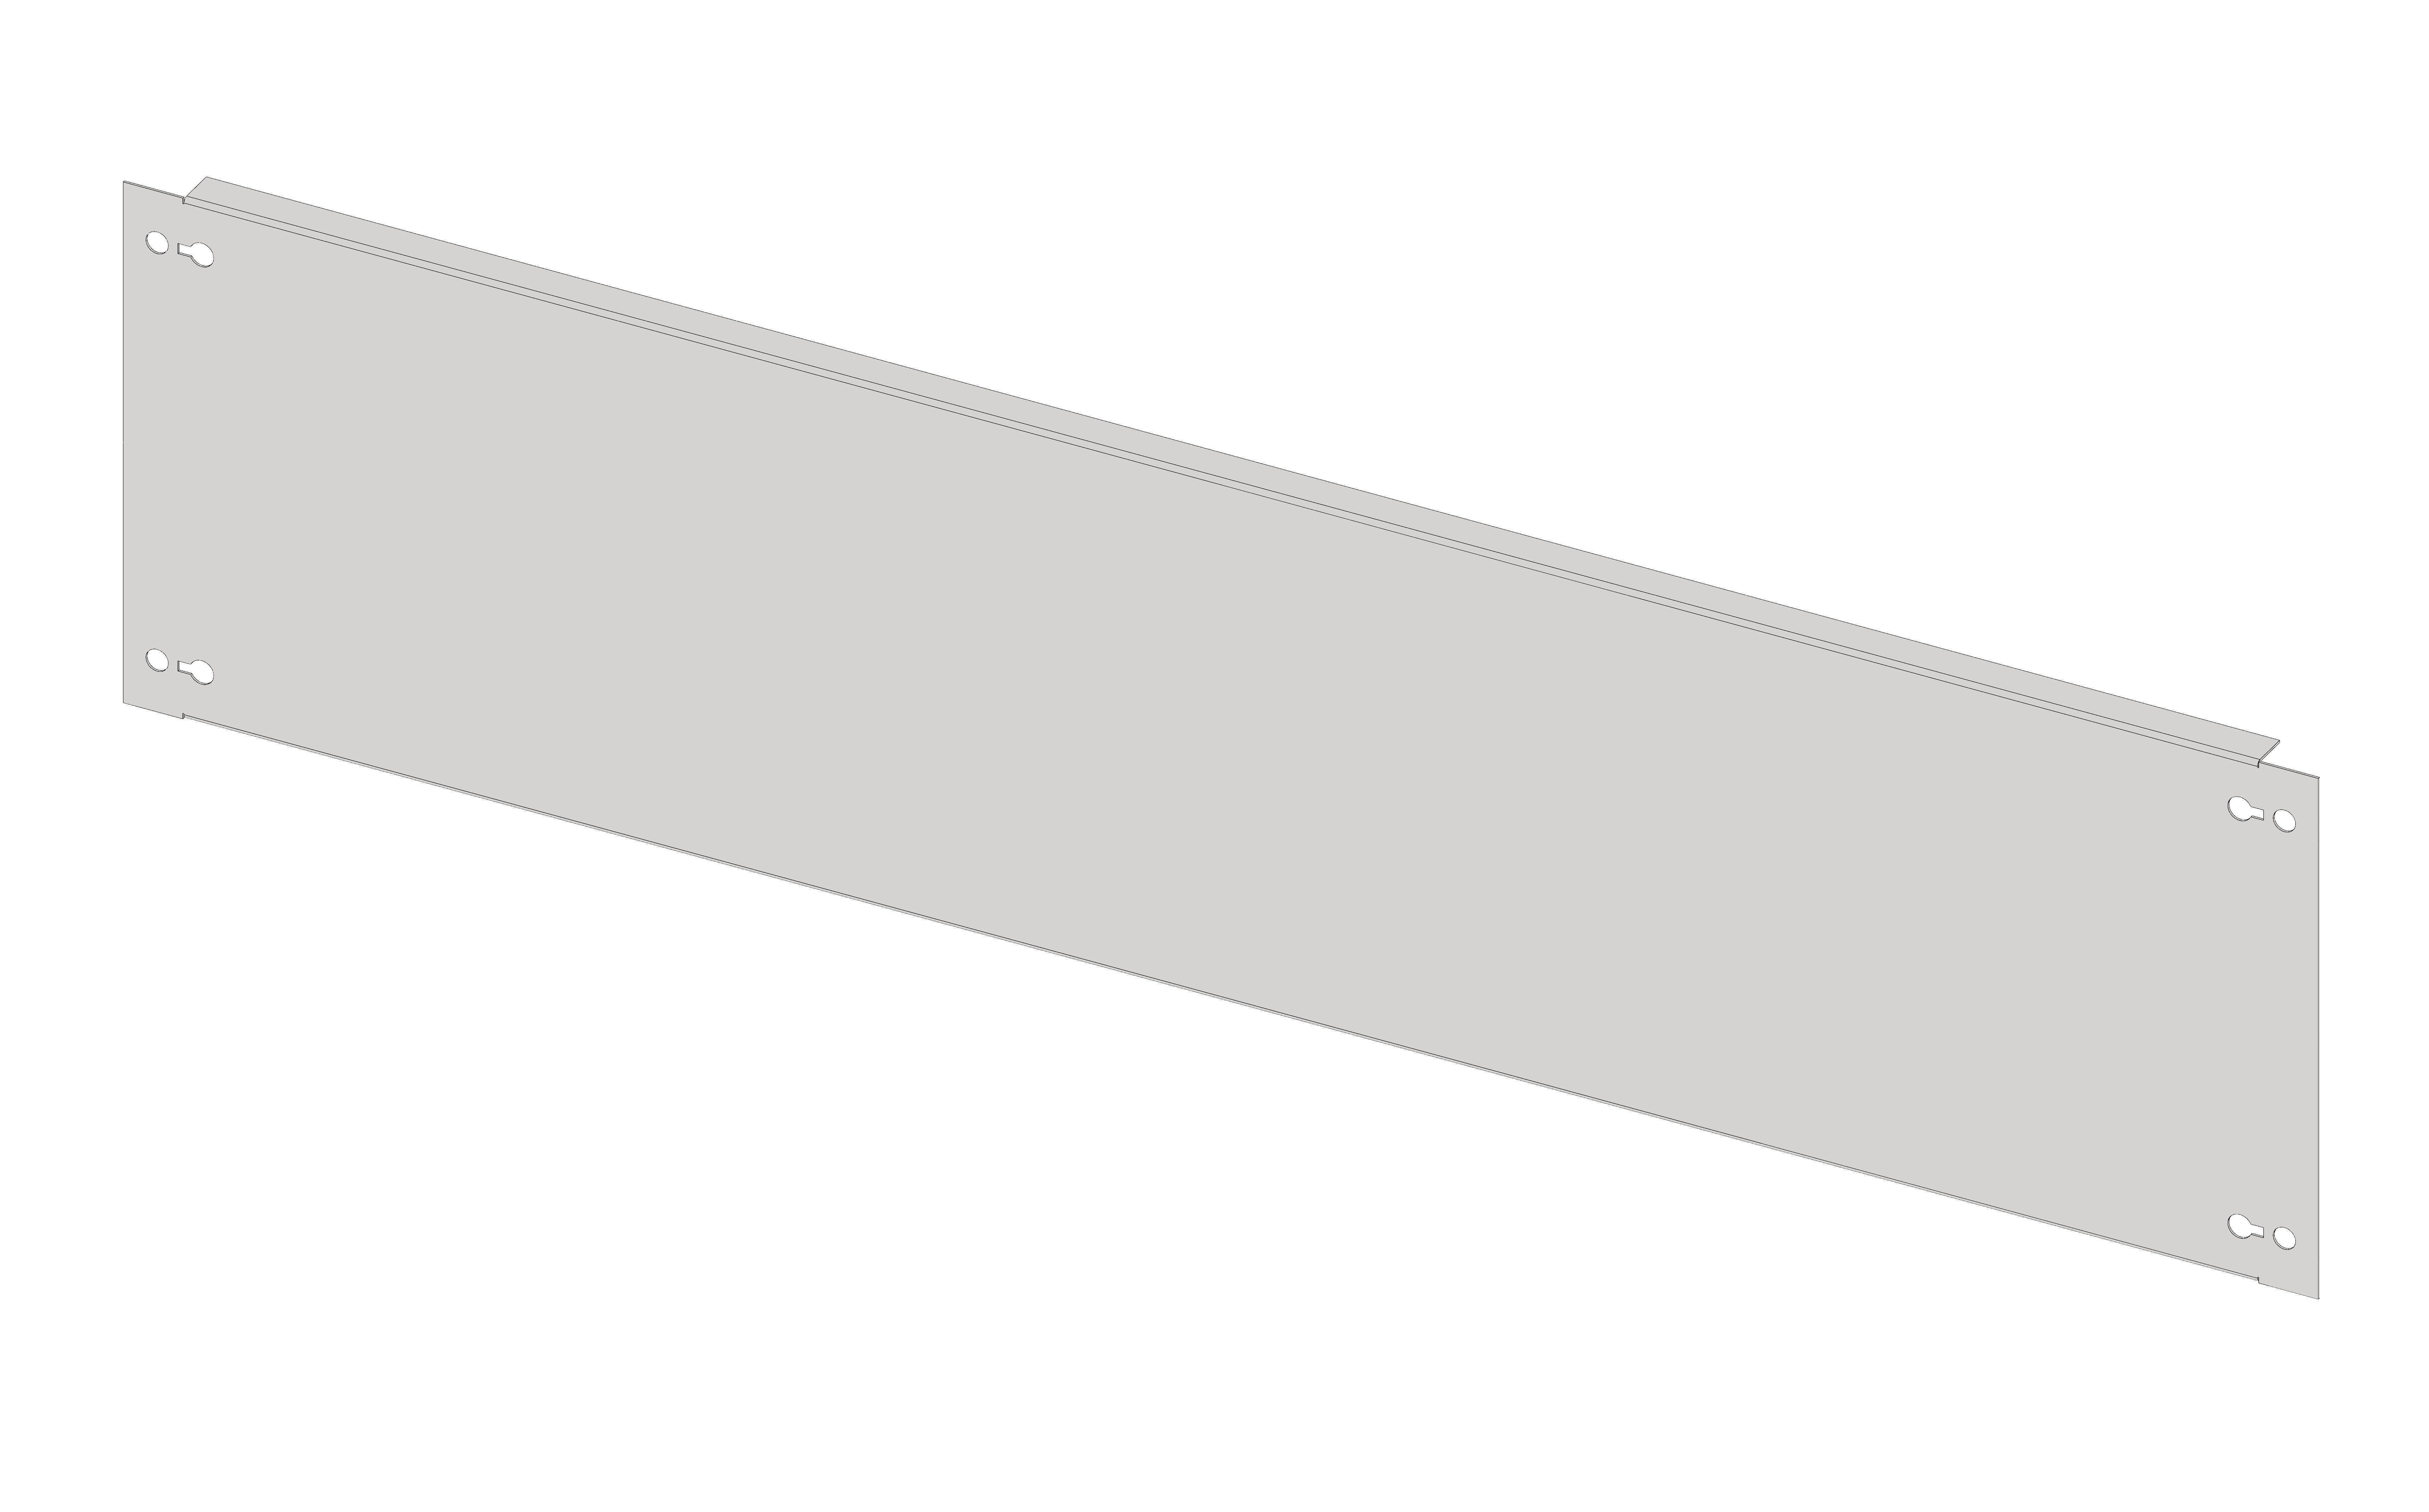 1 Stk Blindfrontplatte 4B5 Stahlblech IL056405-H